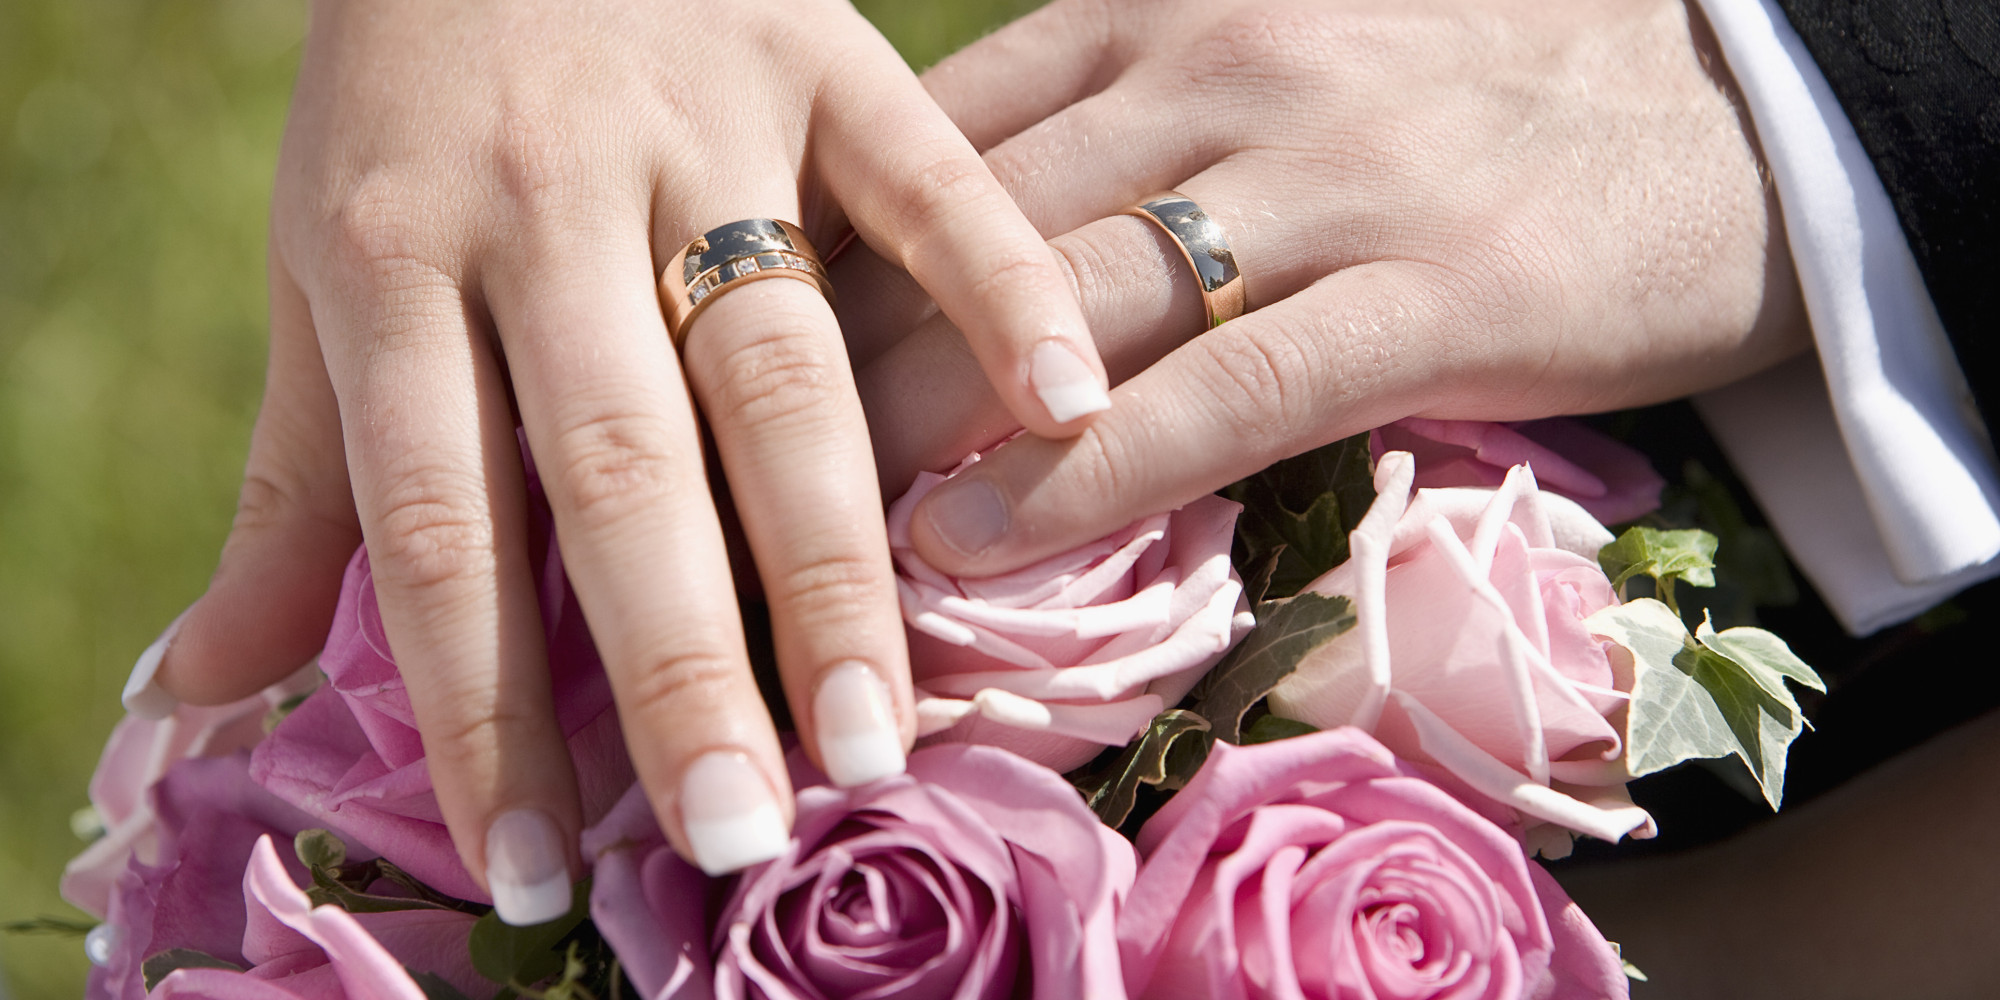 Wedding Ring Poses - Image Wedding Ring Imagemag.co